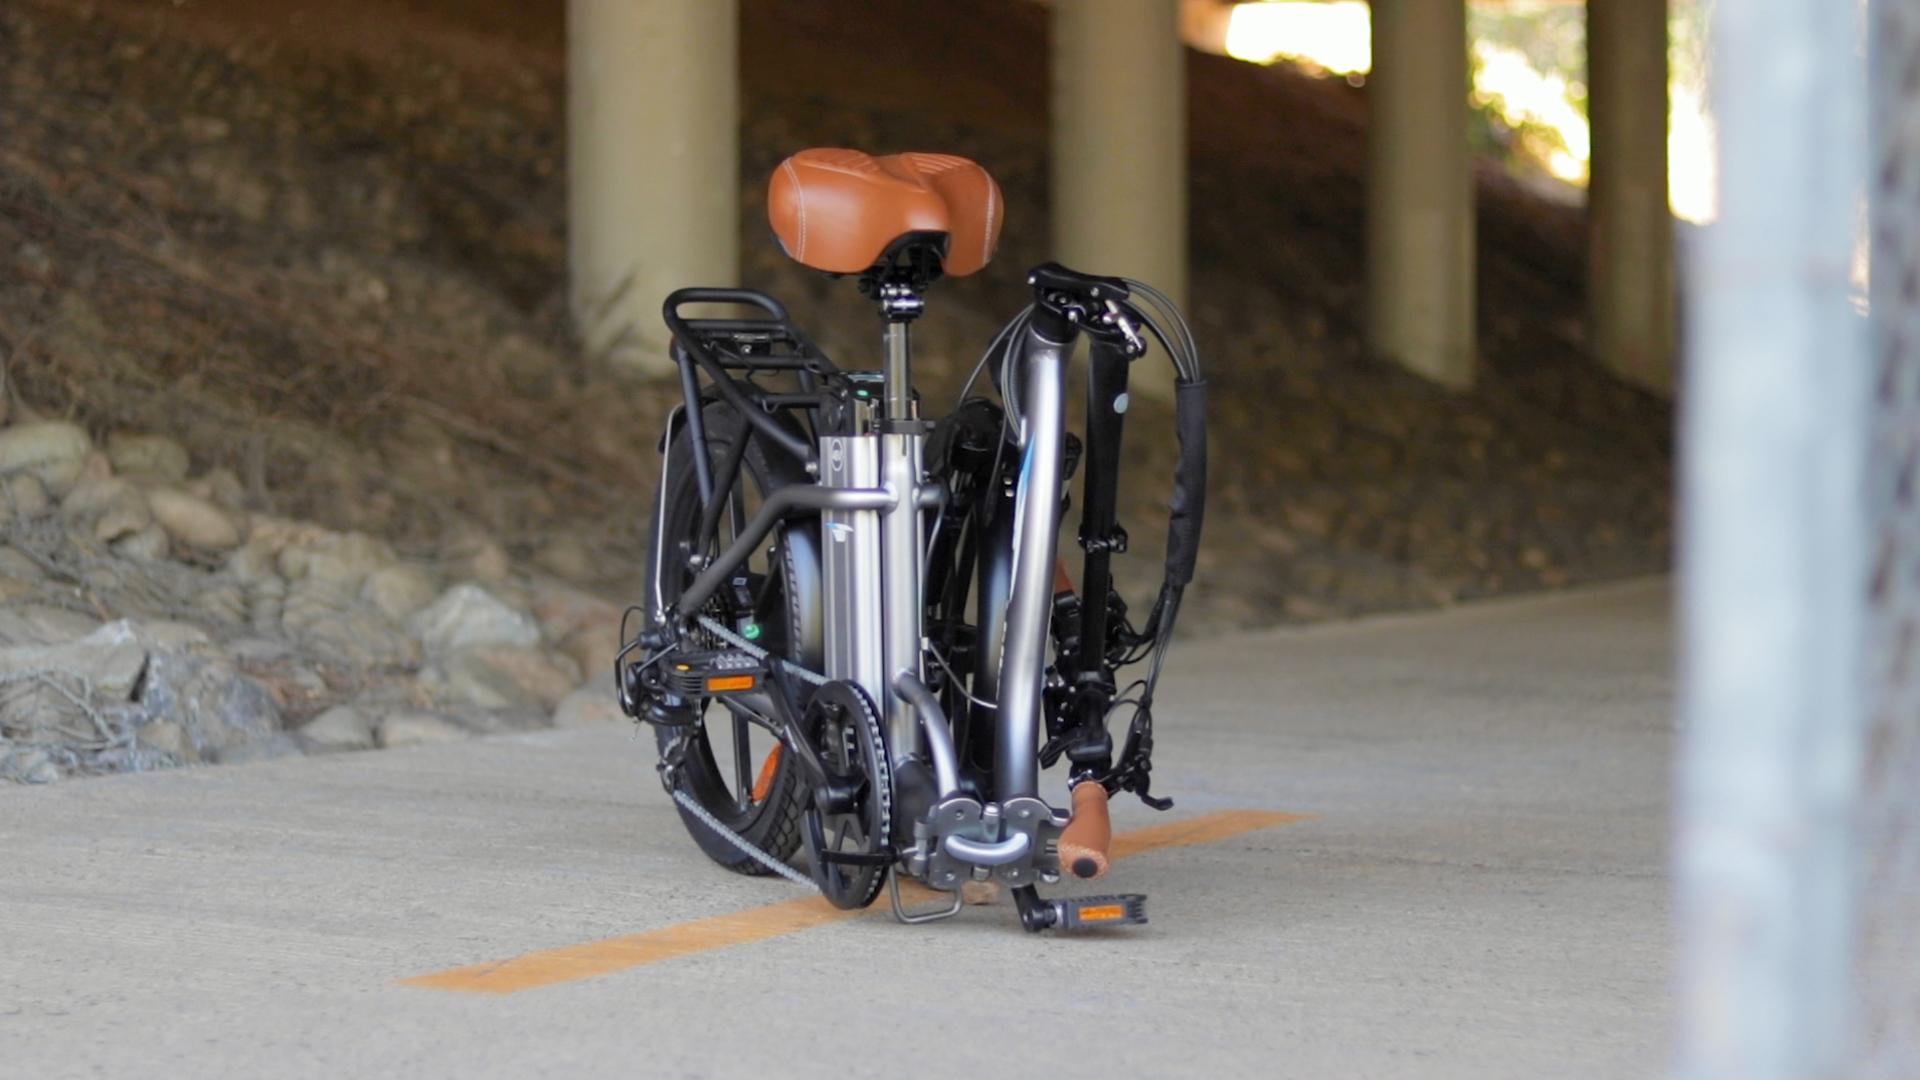 electrified-reviews-bagibike-b10-foldign-electric-bike-review-folded-2.jpg